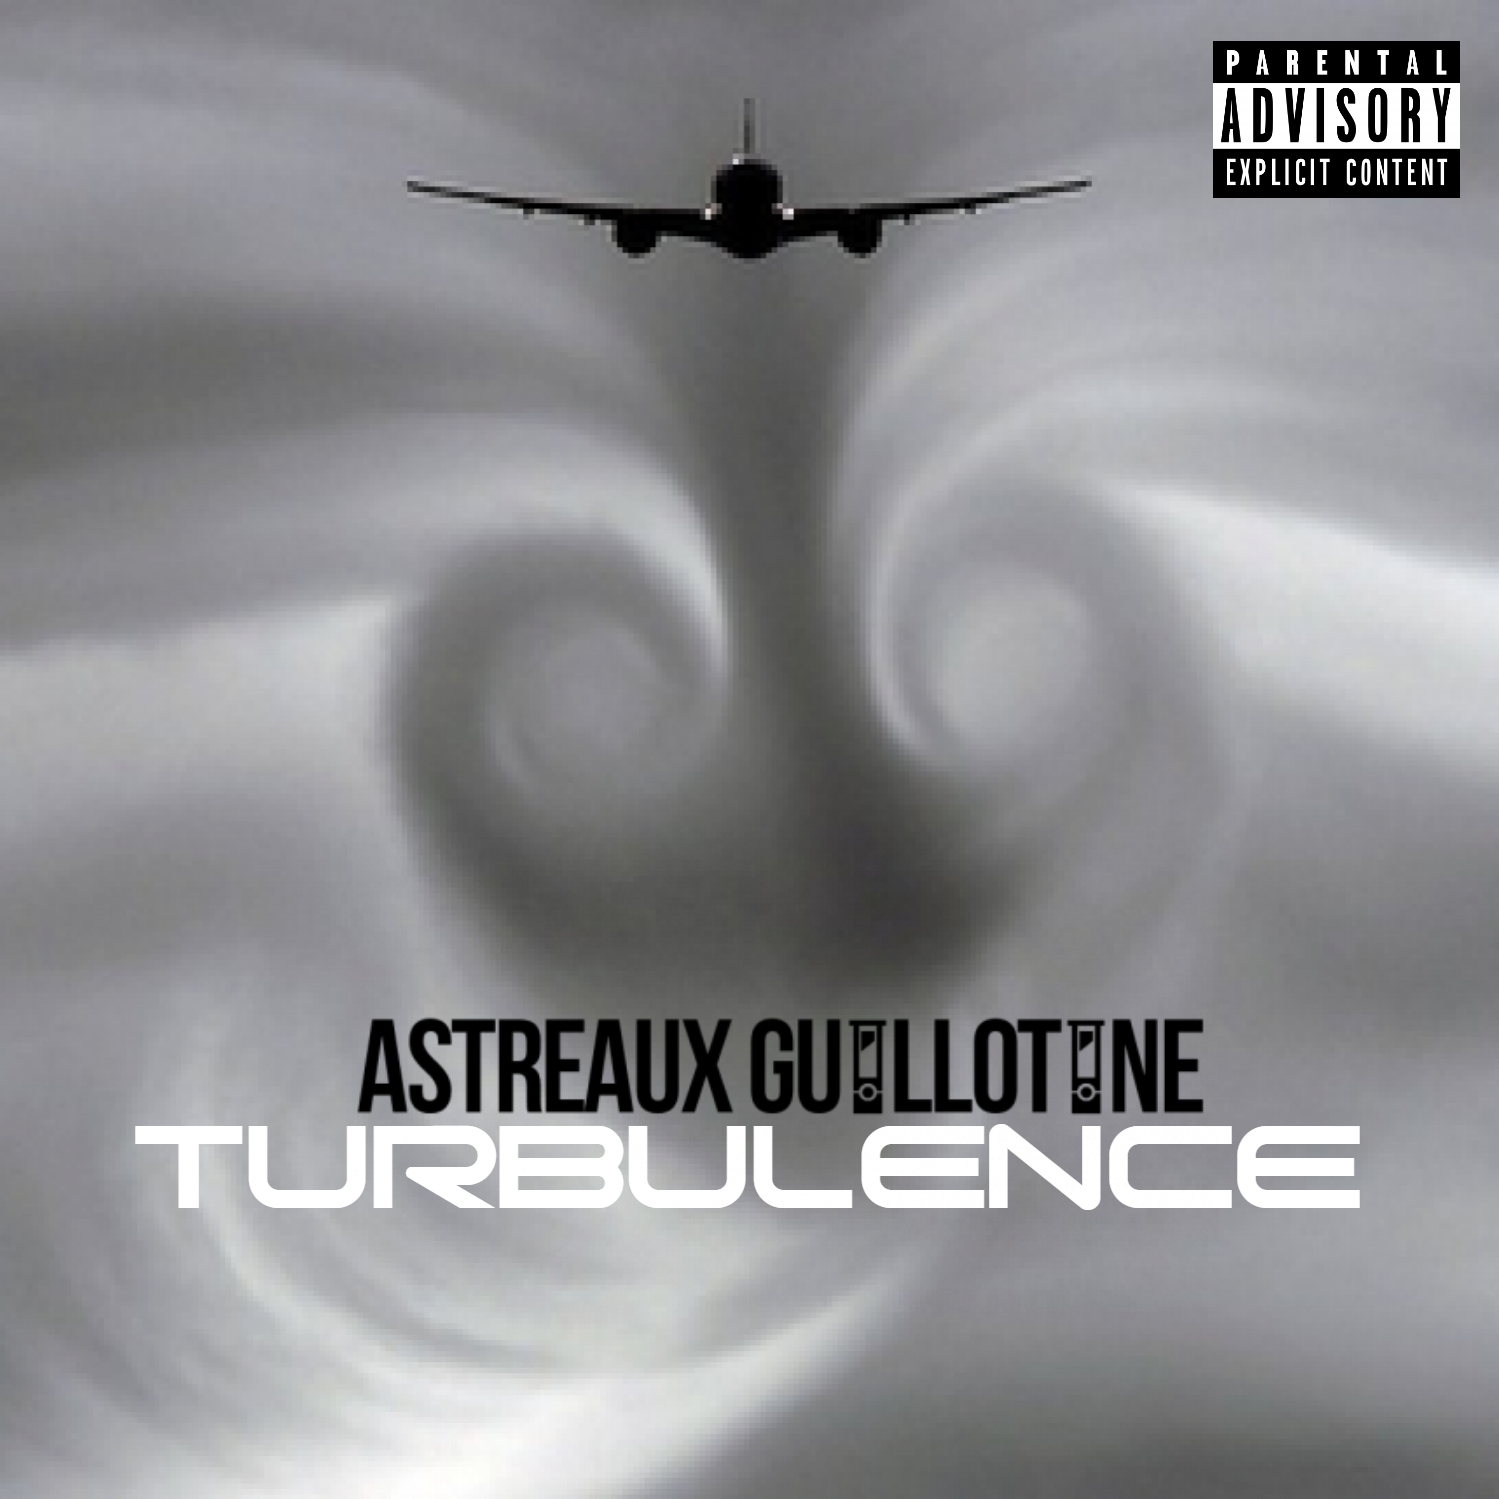 AstreauxGuillotineTurbulence